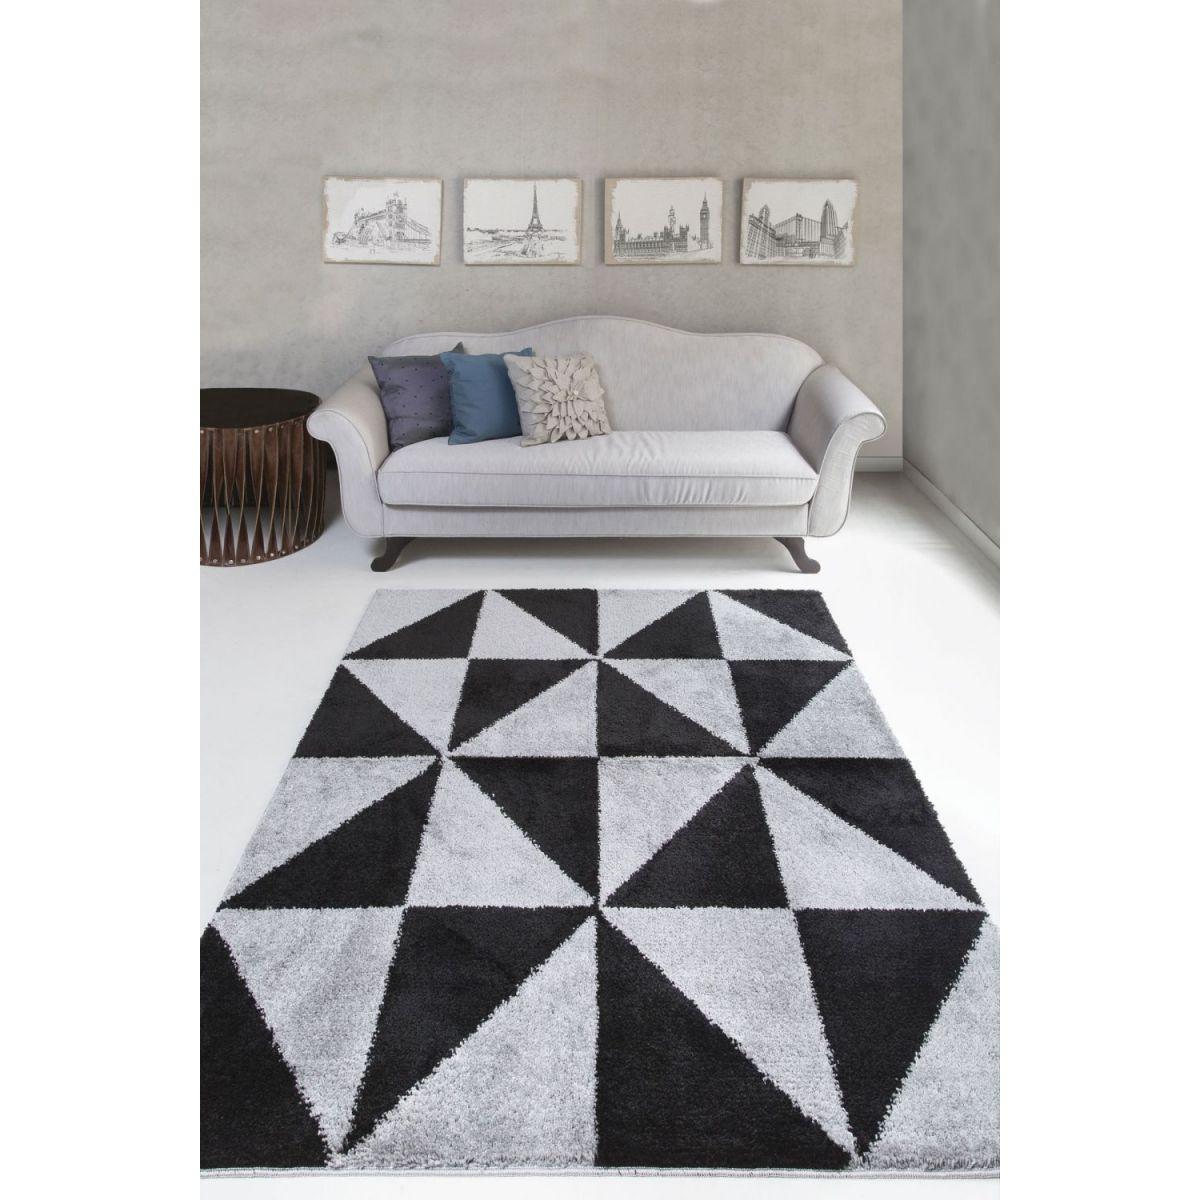 tapete de sala jolitex 1 50x1 00 domo ladrilhos. Black Bedroom Furniture Sets. Home Design Ideas